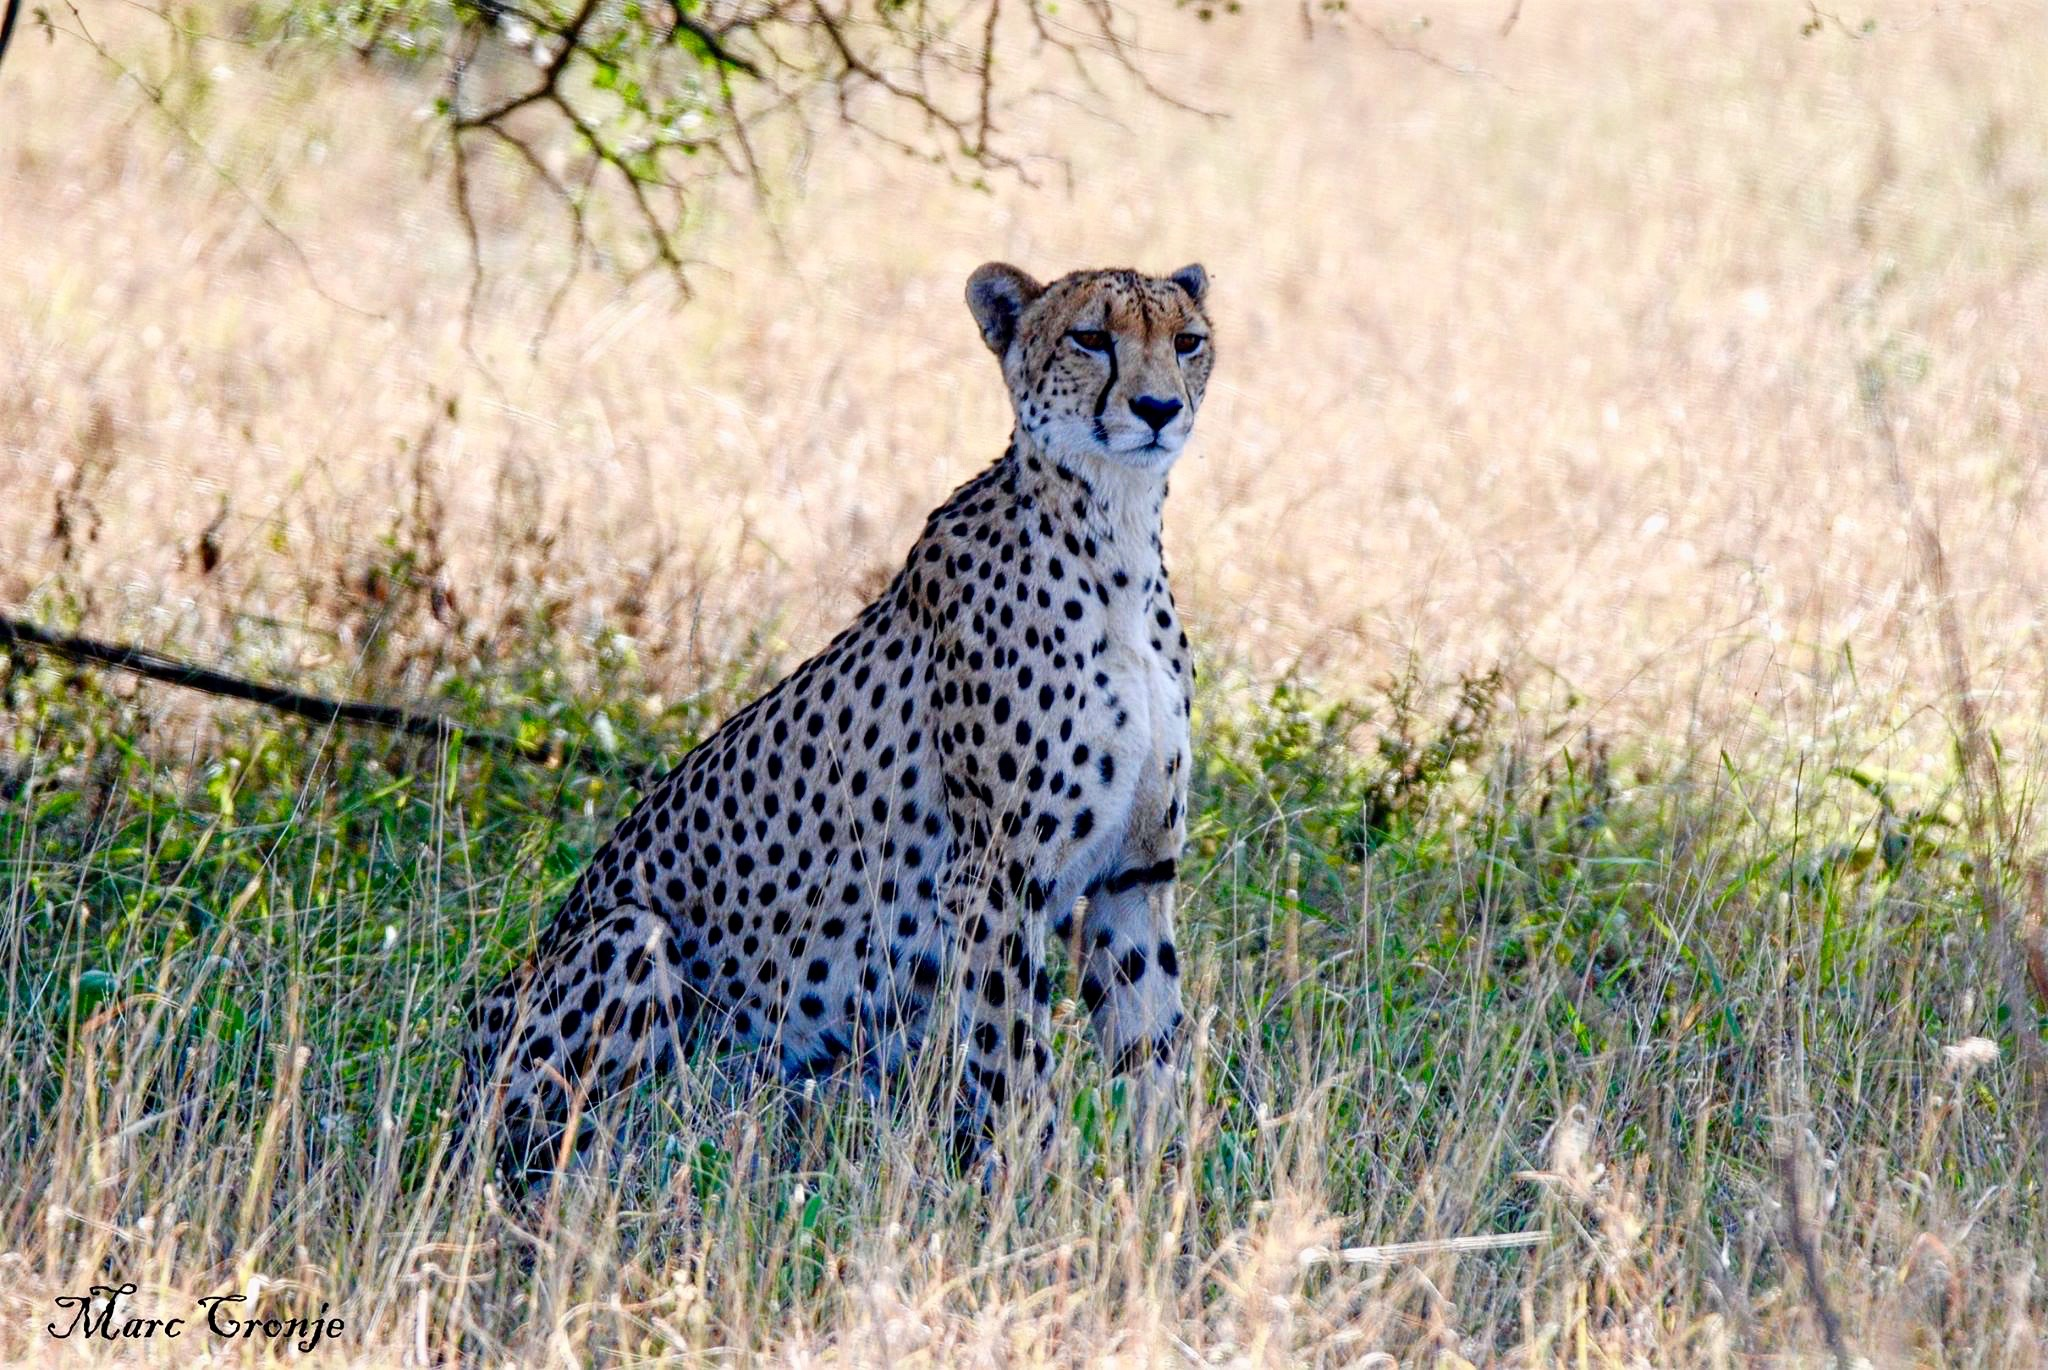 Cheetah mama 13235159_10209330157354536_1011689380703705845_o-2 (1).jpg